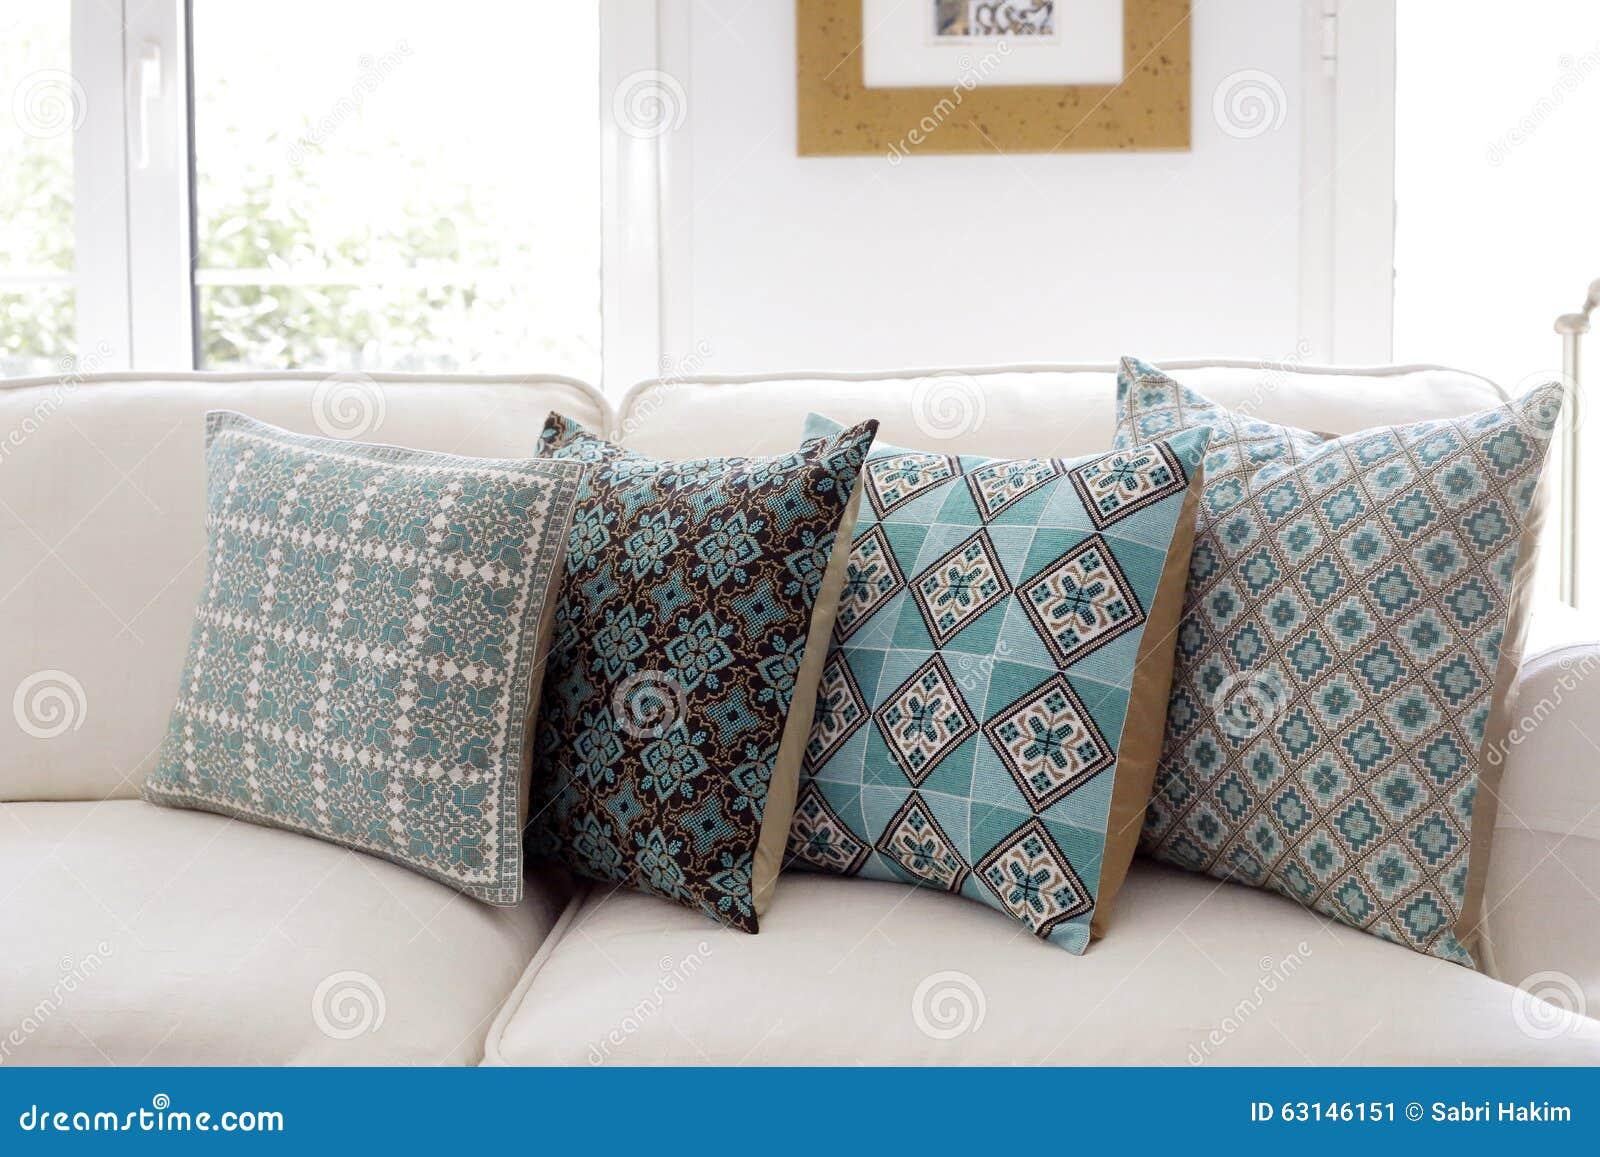 handmade embroidered pillows on sofa stock photo - image: 63146151